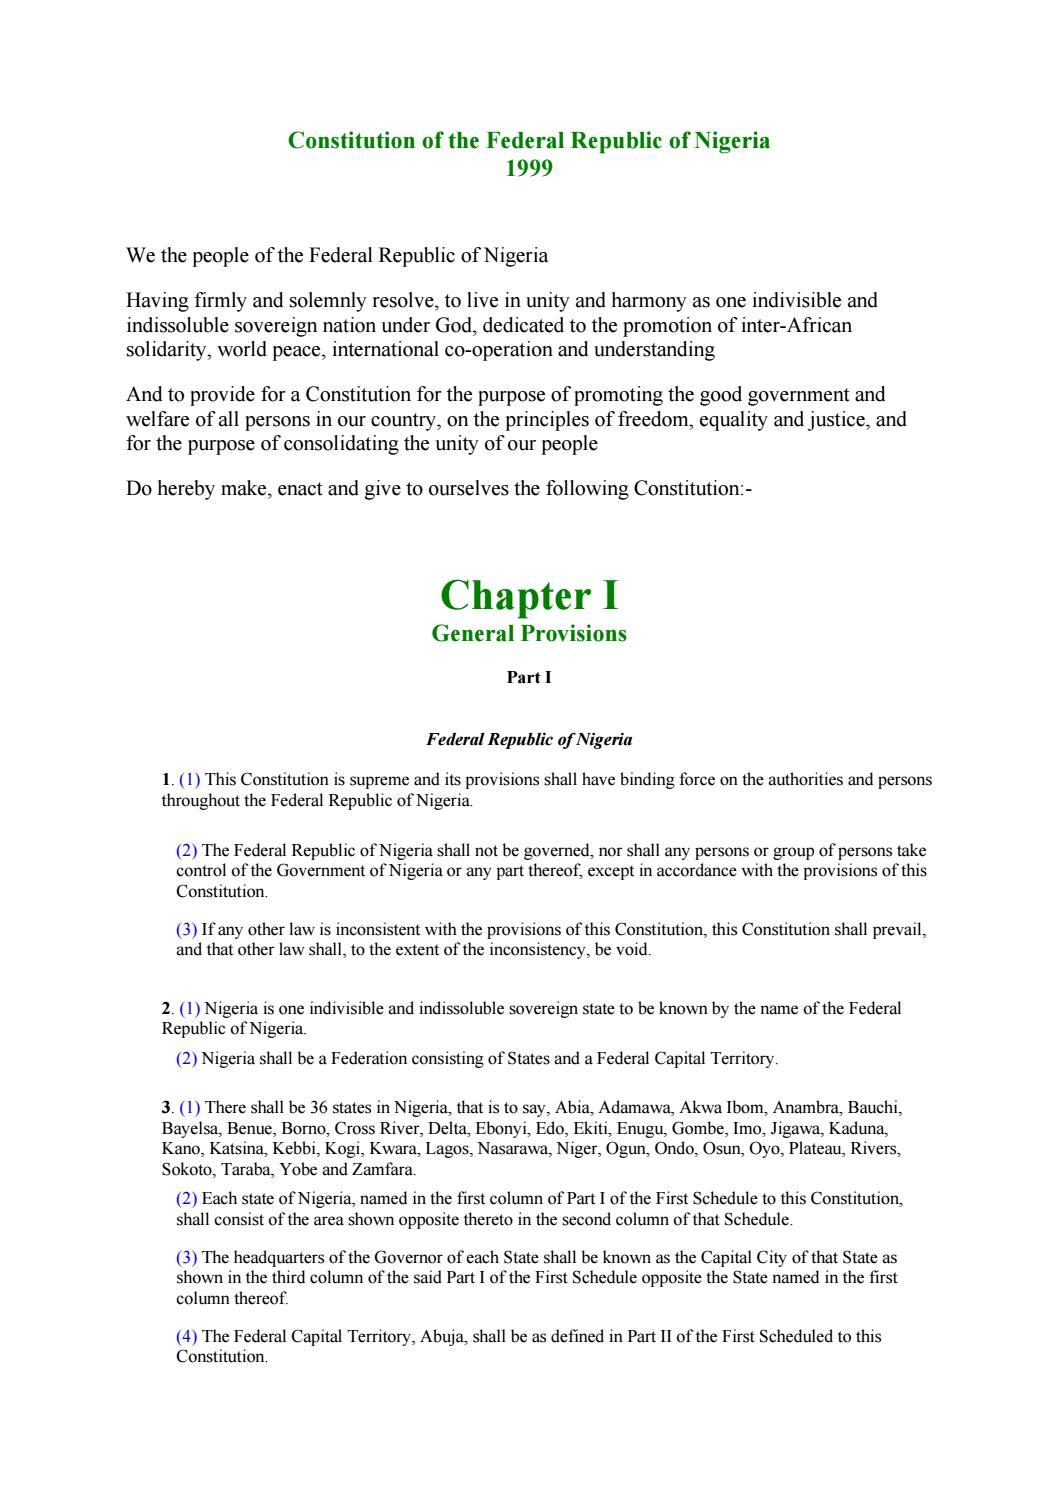 Federal Republic of Nigeria: capital, flag, people, language, geography 26